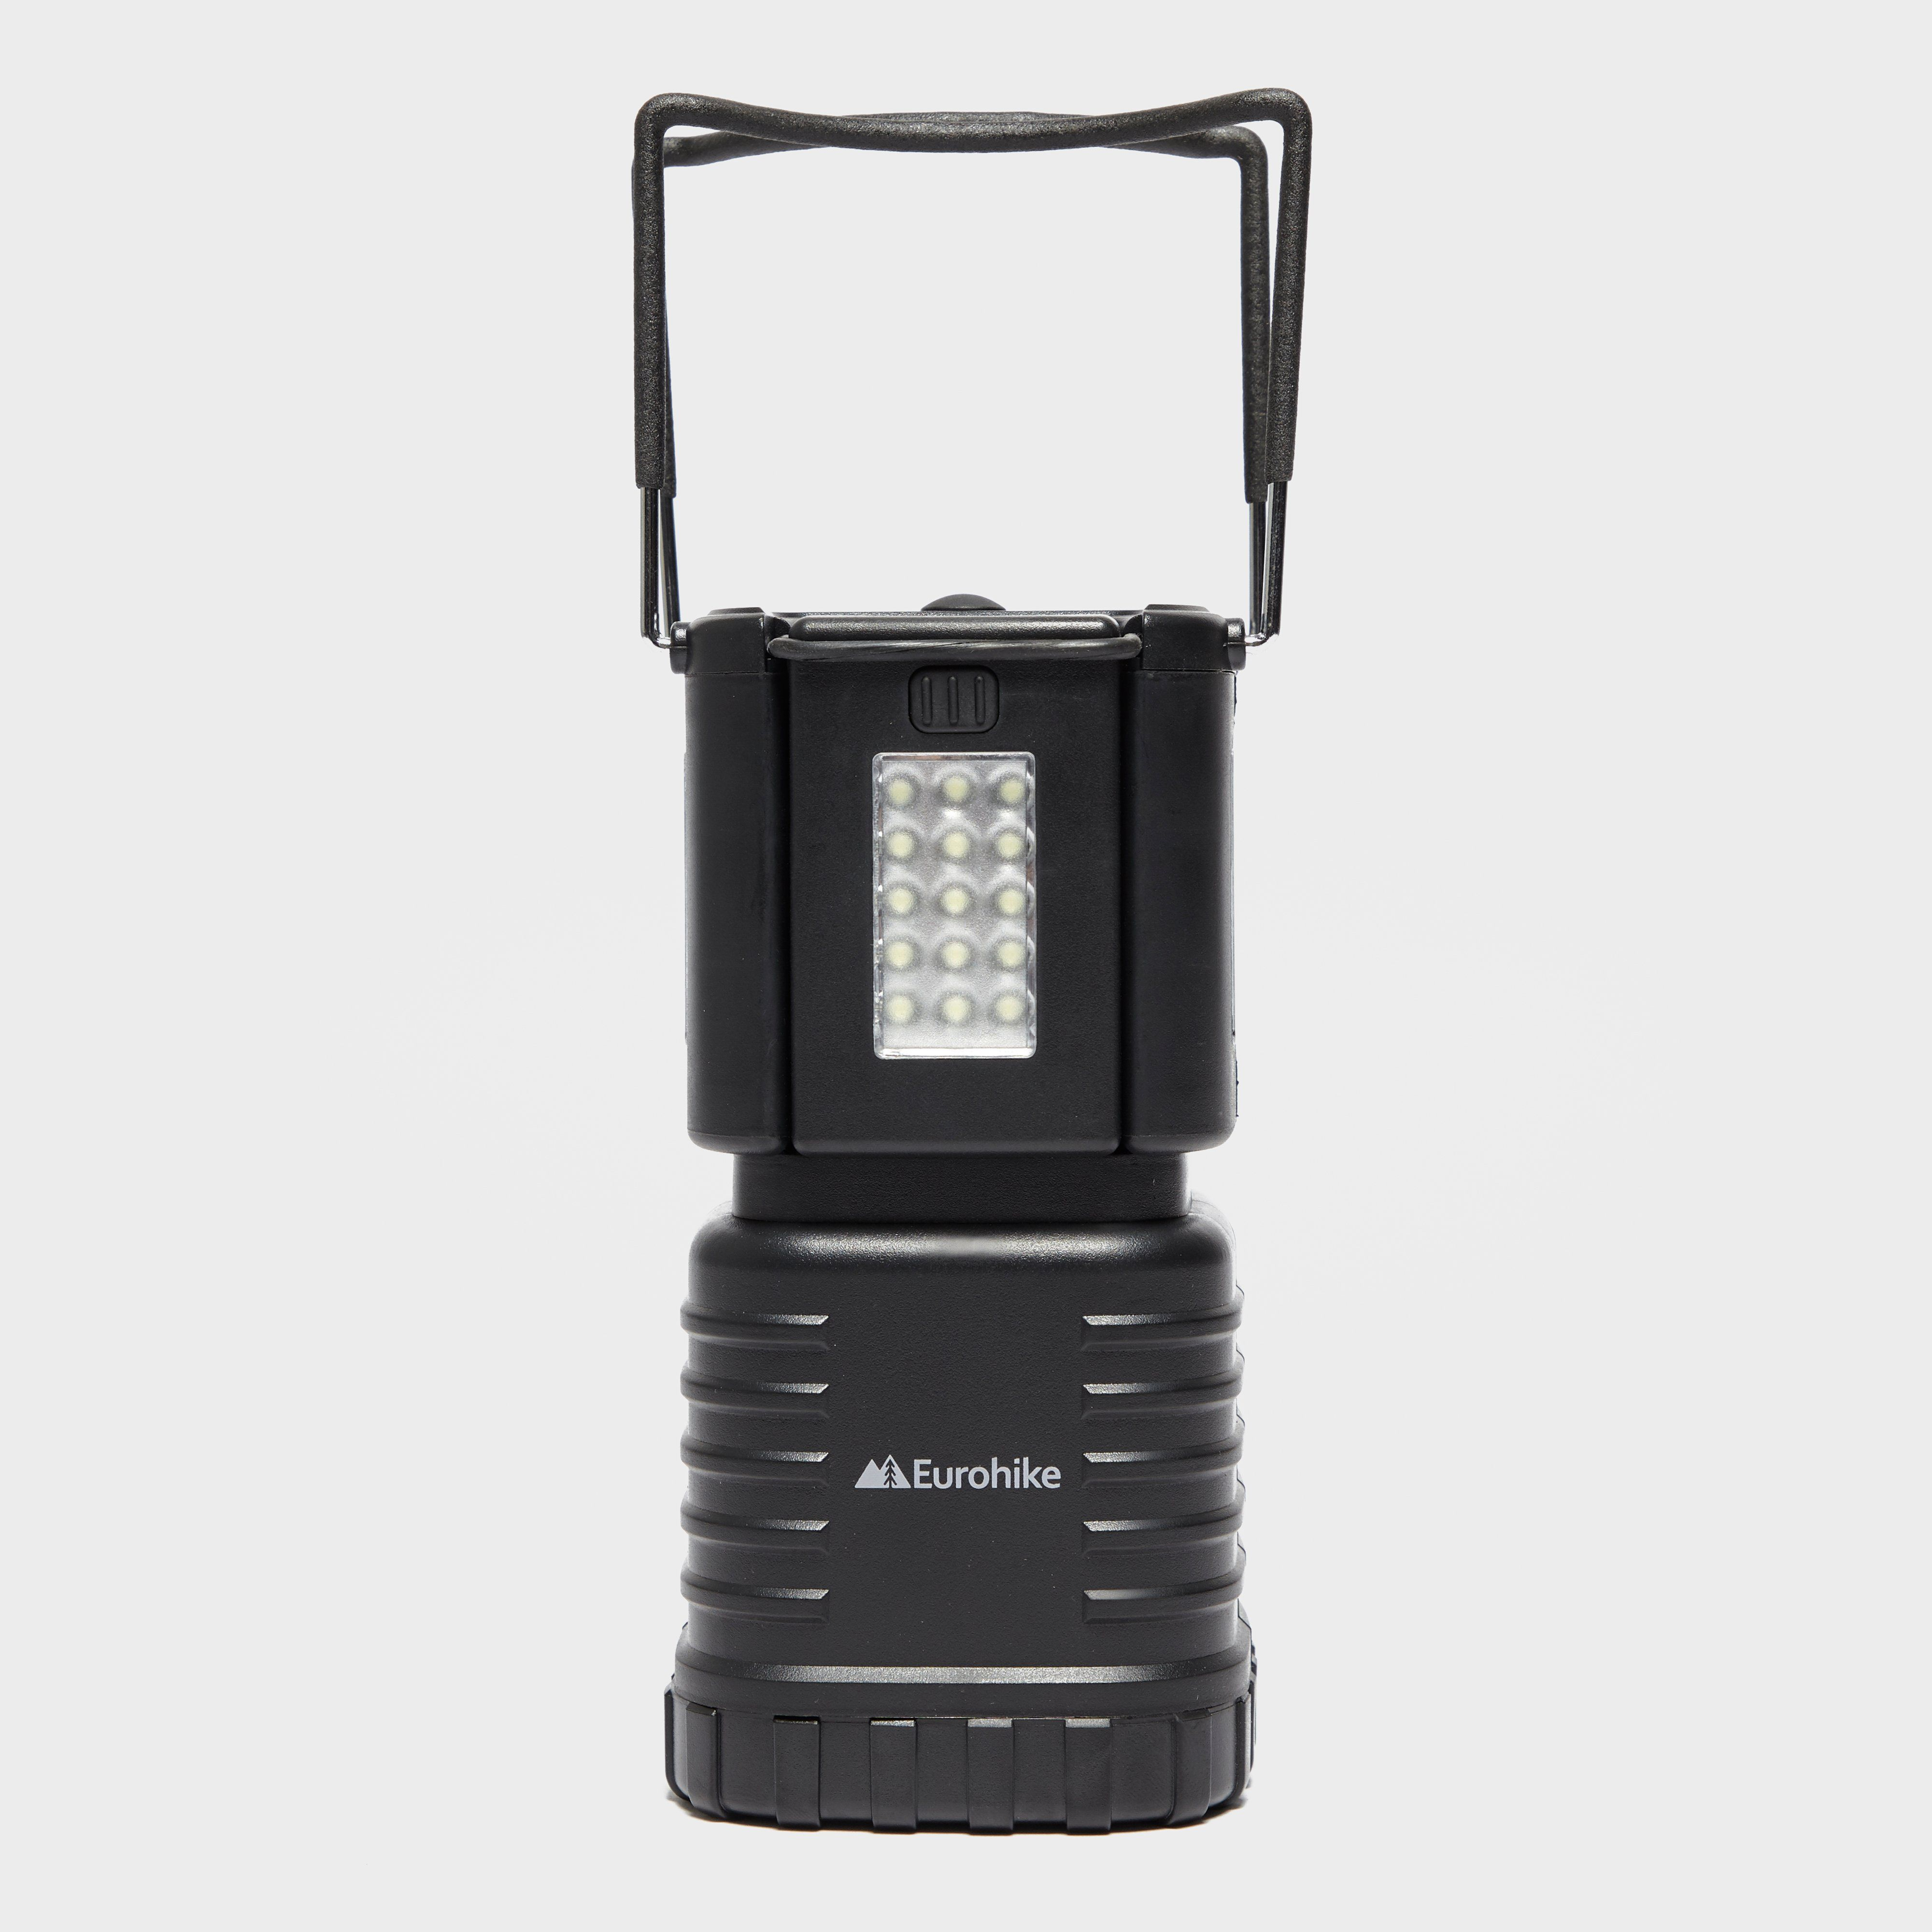 EUROHIKE 66 LED Lantern + 2 Torches